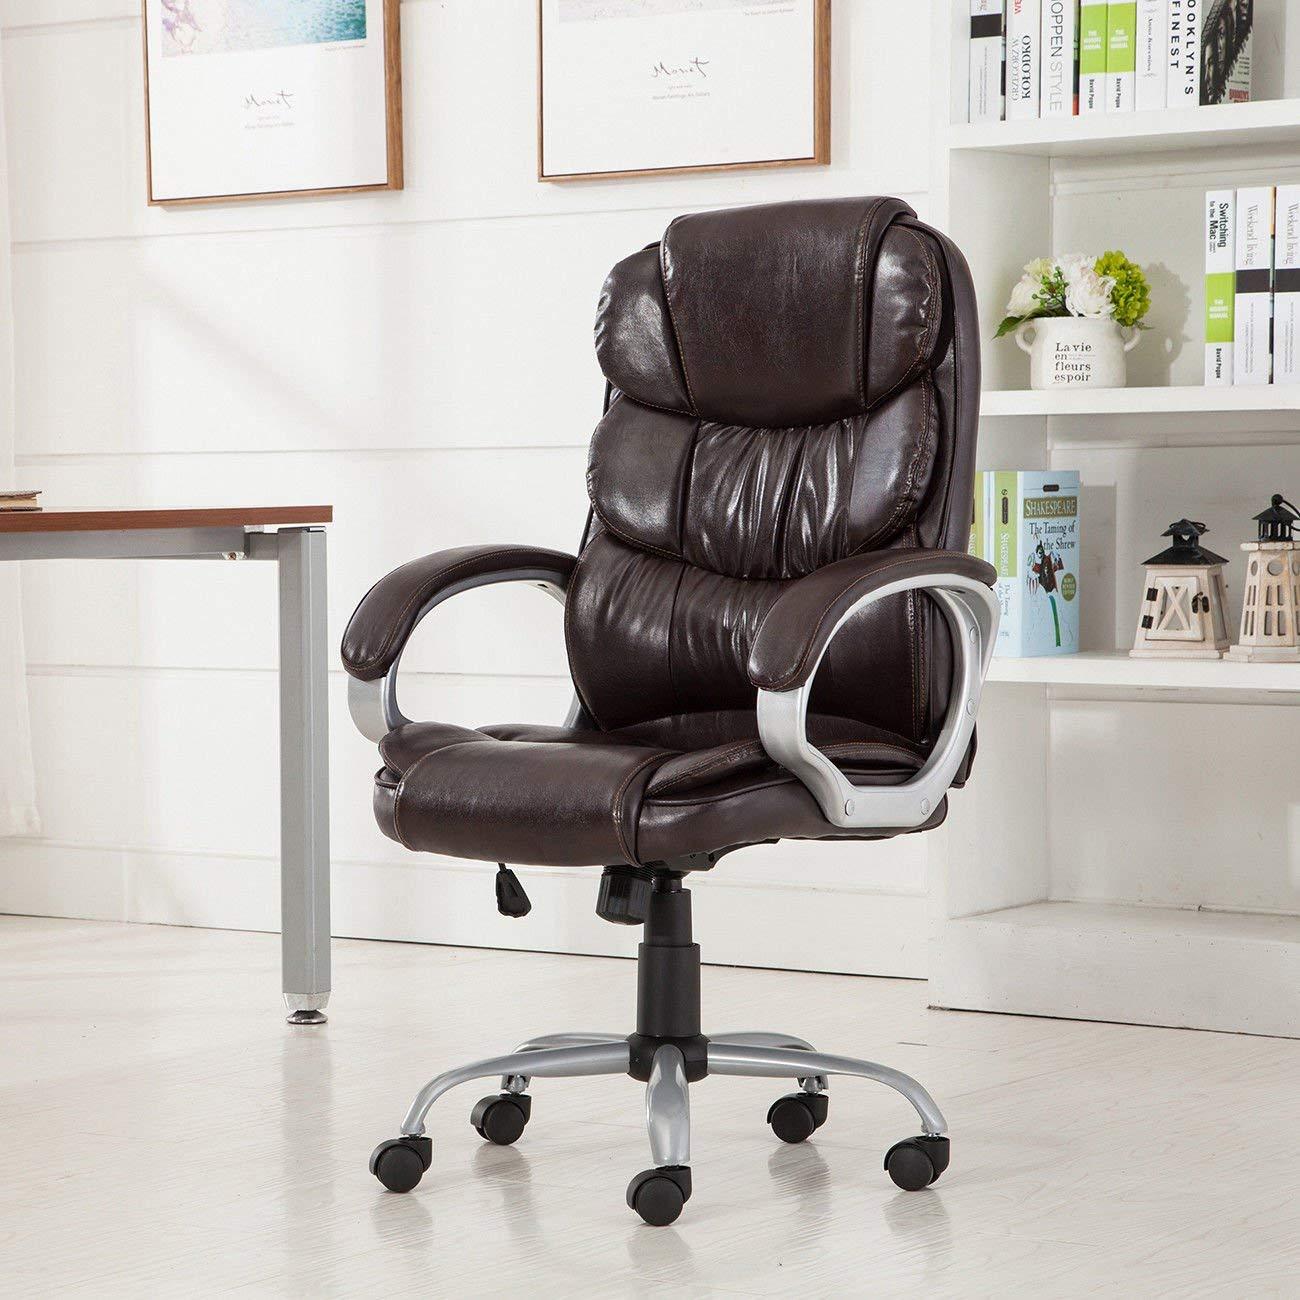 "GHP 24""x24""x43"" 330-Lbs Capacity Mocha PU Leather High Back Executive Office Chair"